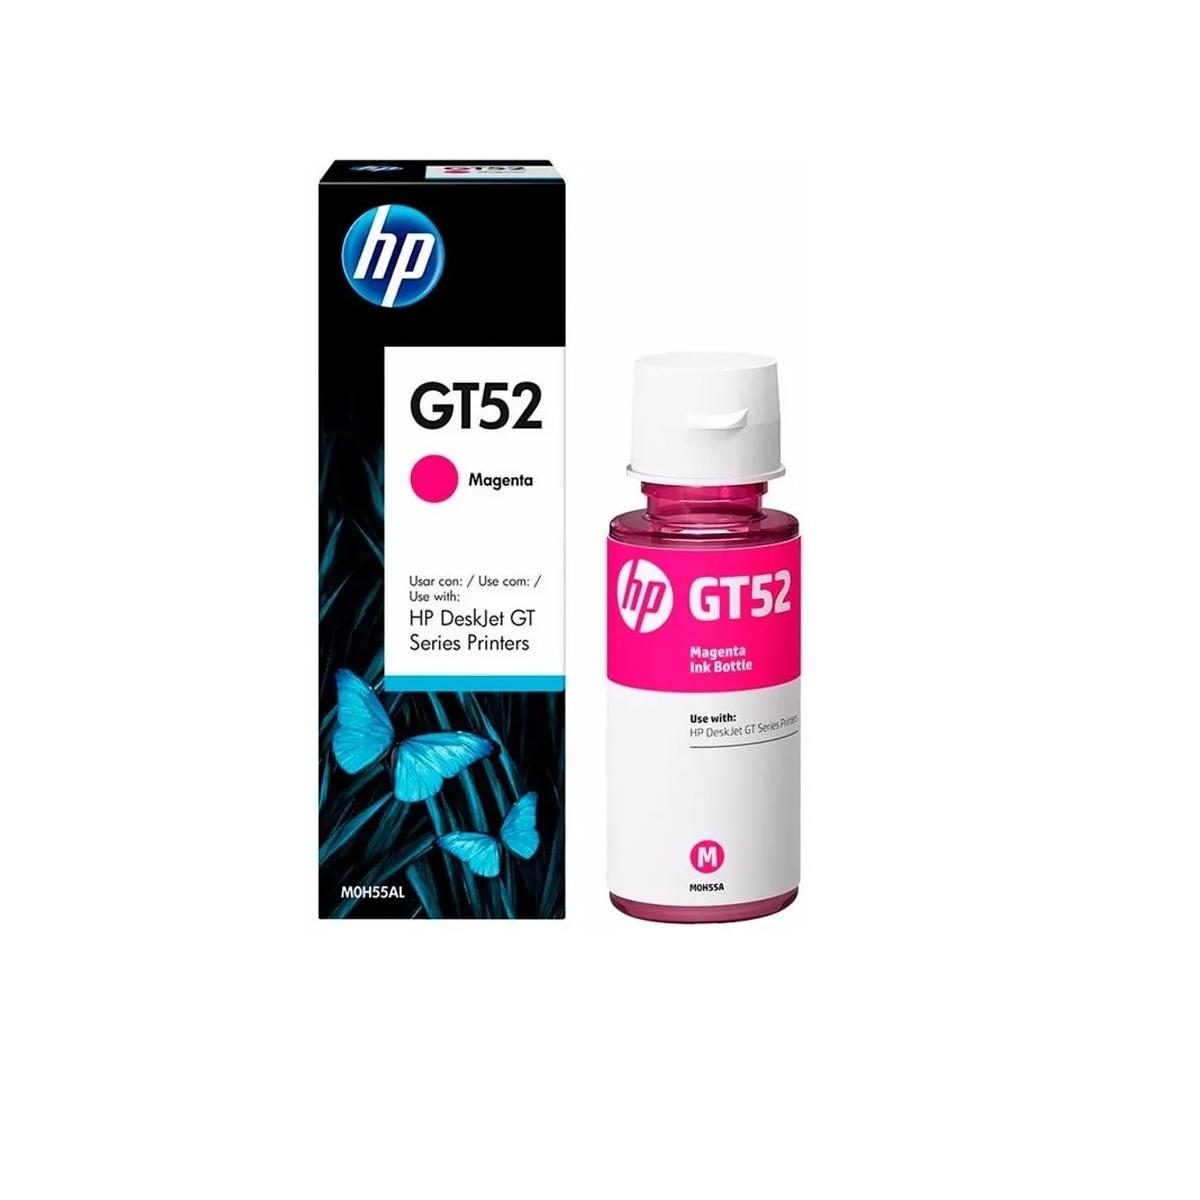 GT52-M0H55AL